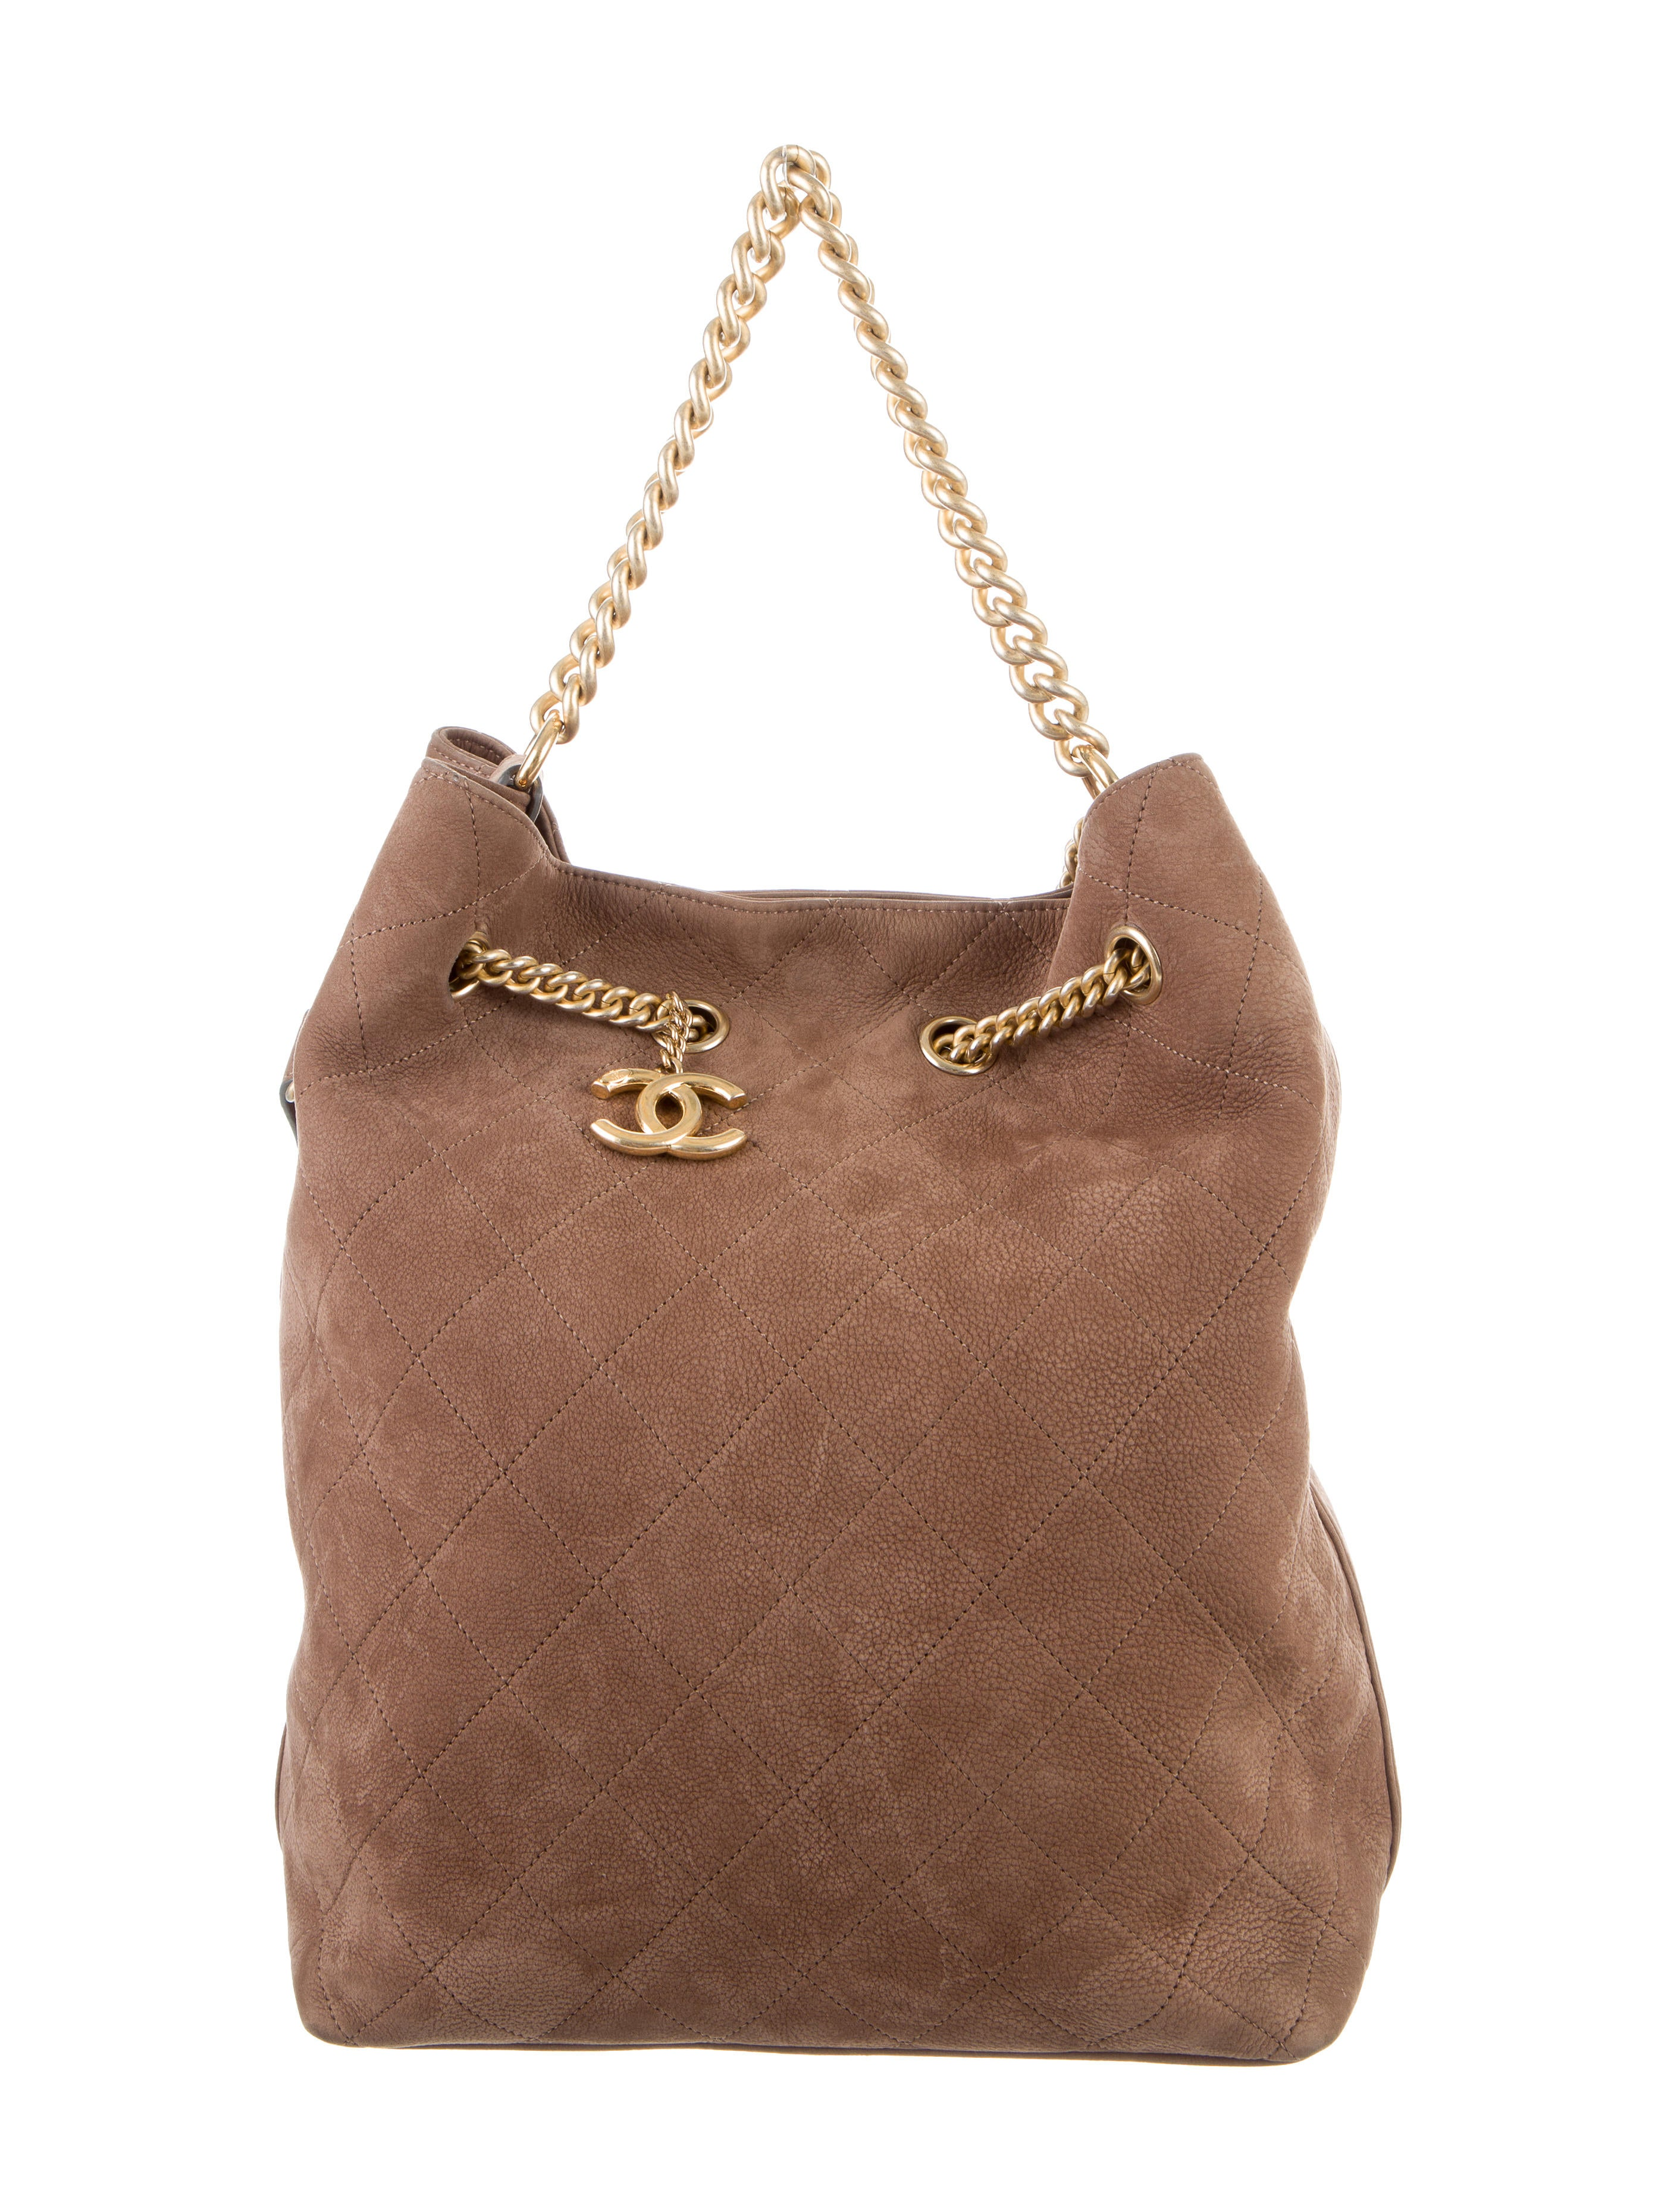 3170c39cabe4 Chanel 2016 Large On My Shoulder Drawstring Bag - Handbags - CHA190292 | The  RealReal